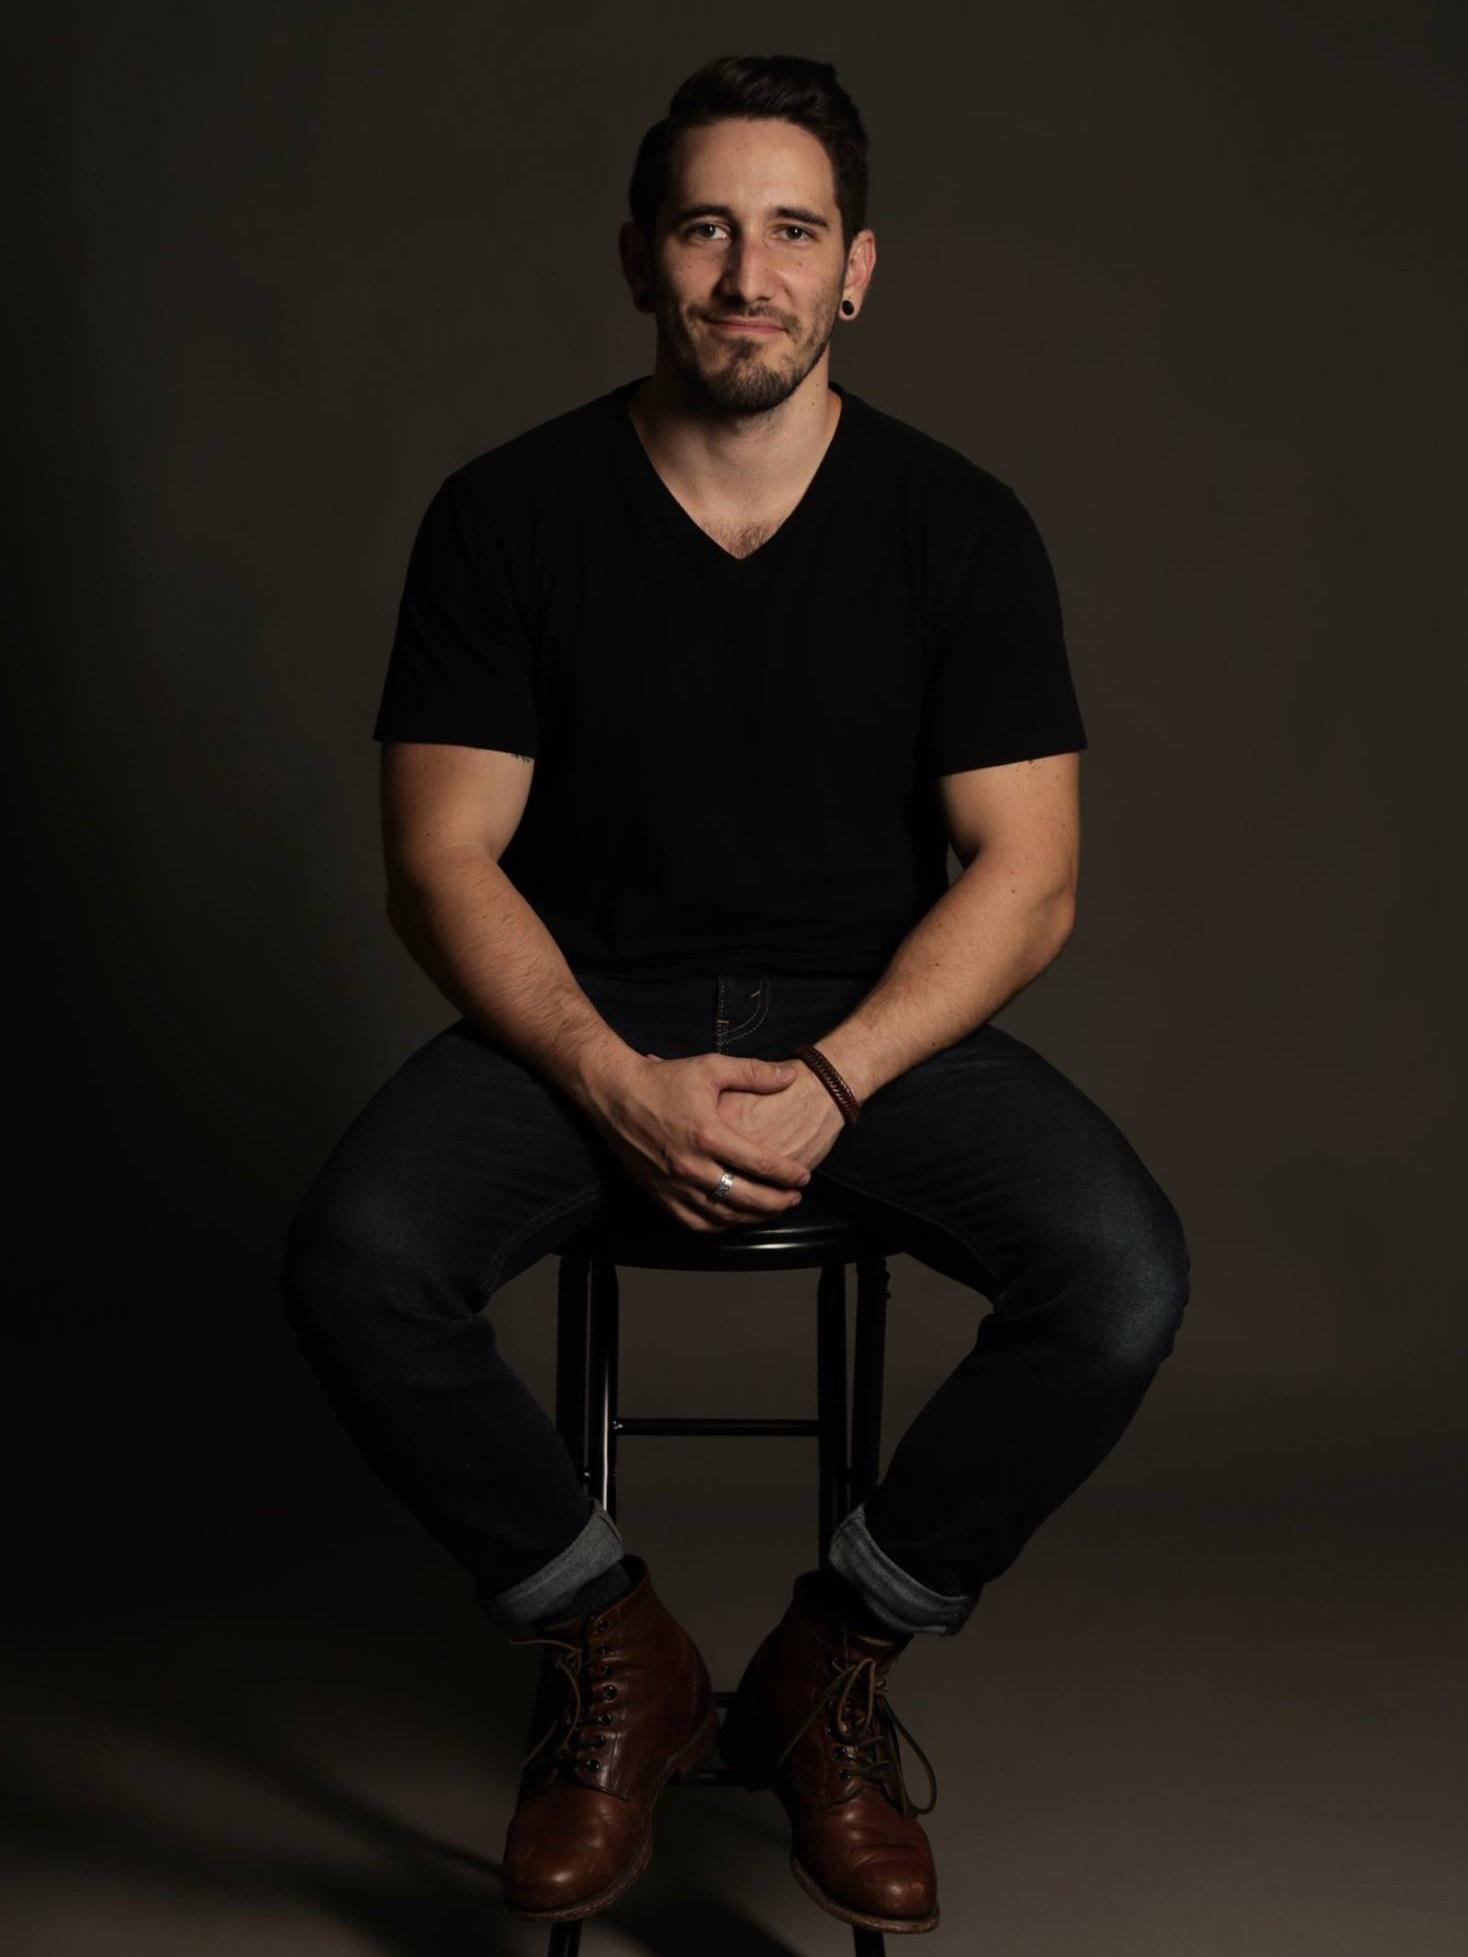 Chris - Filmmaker